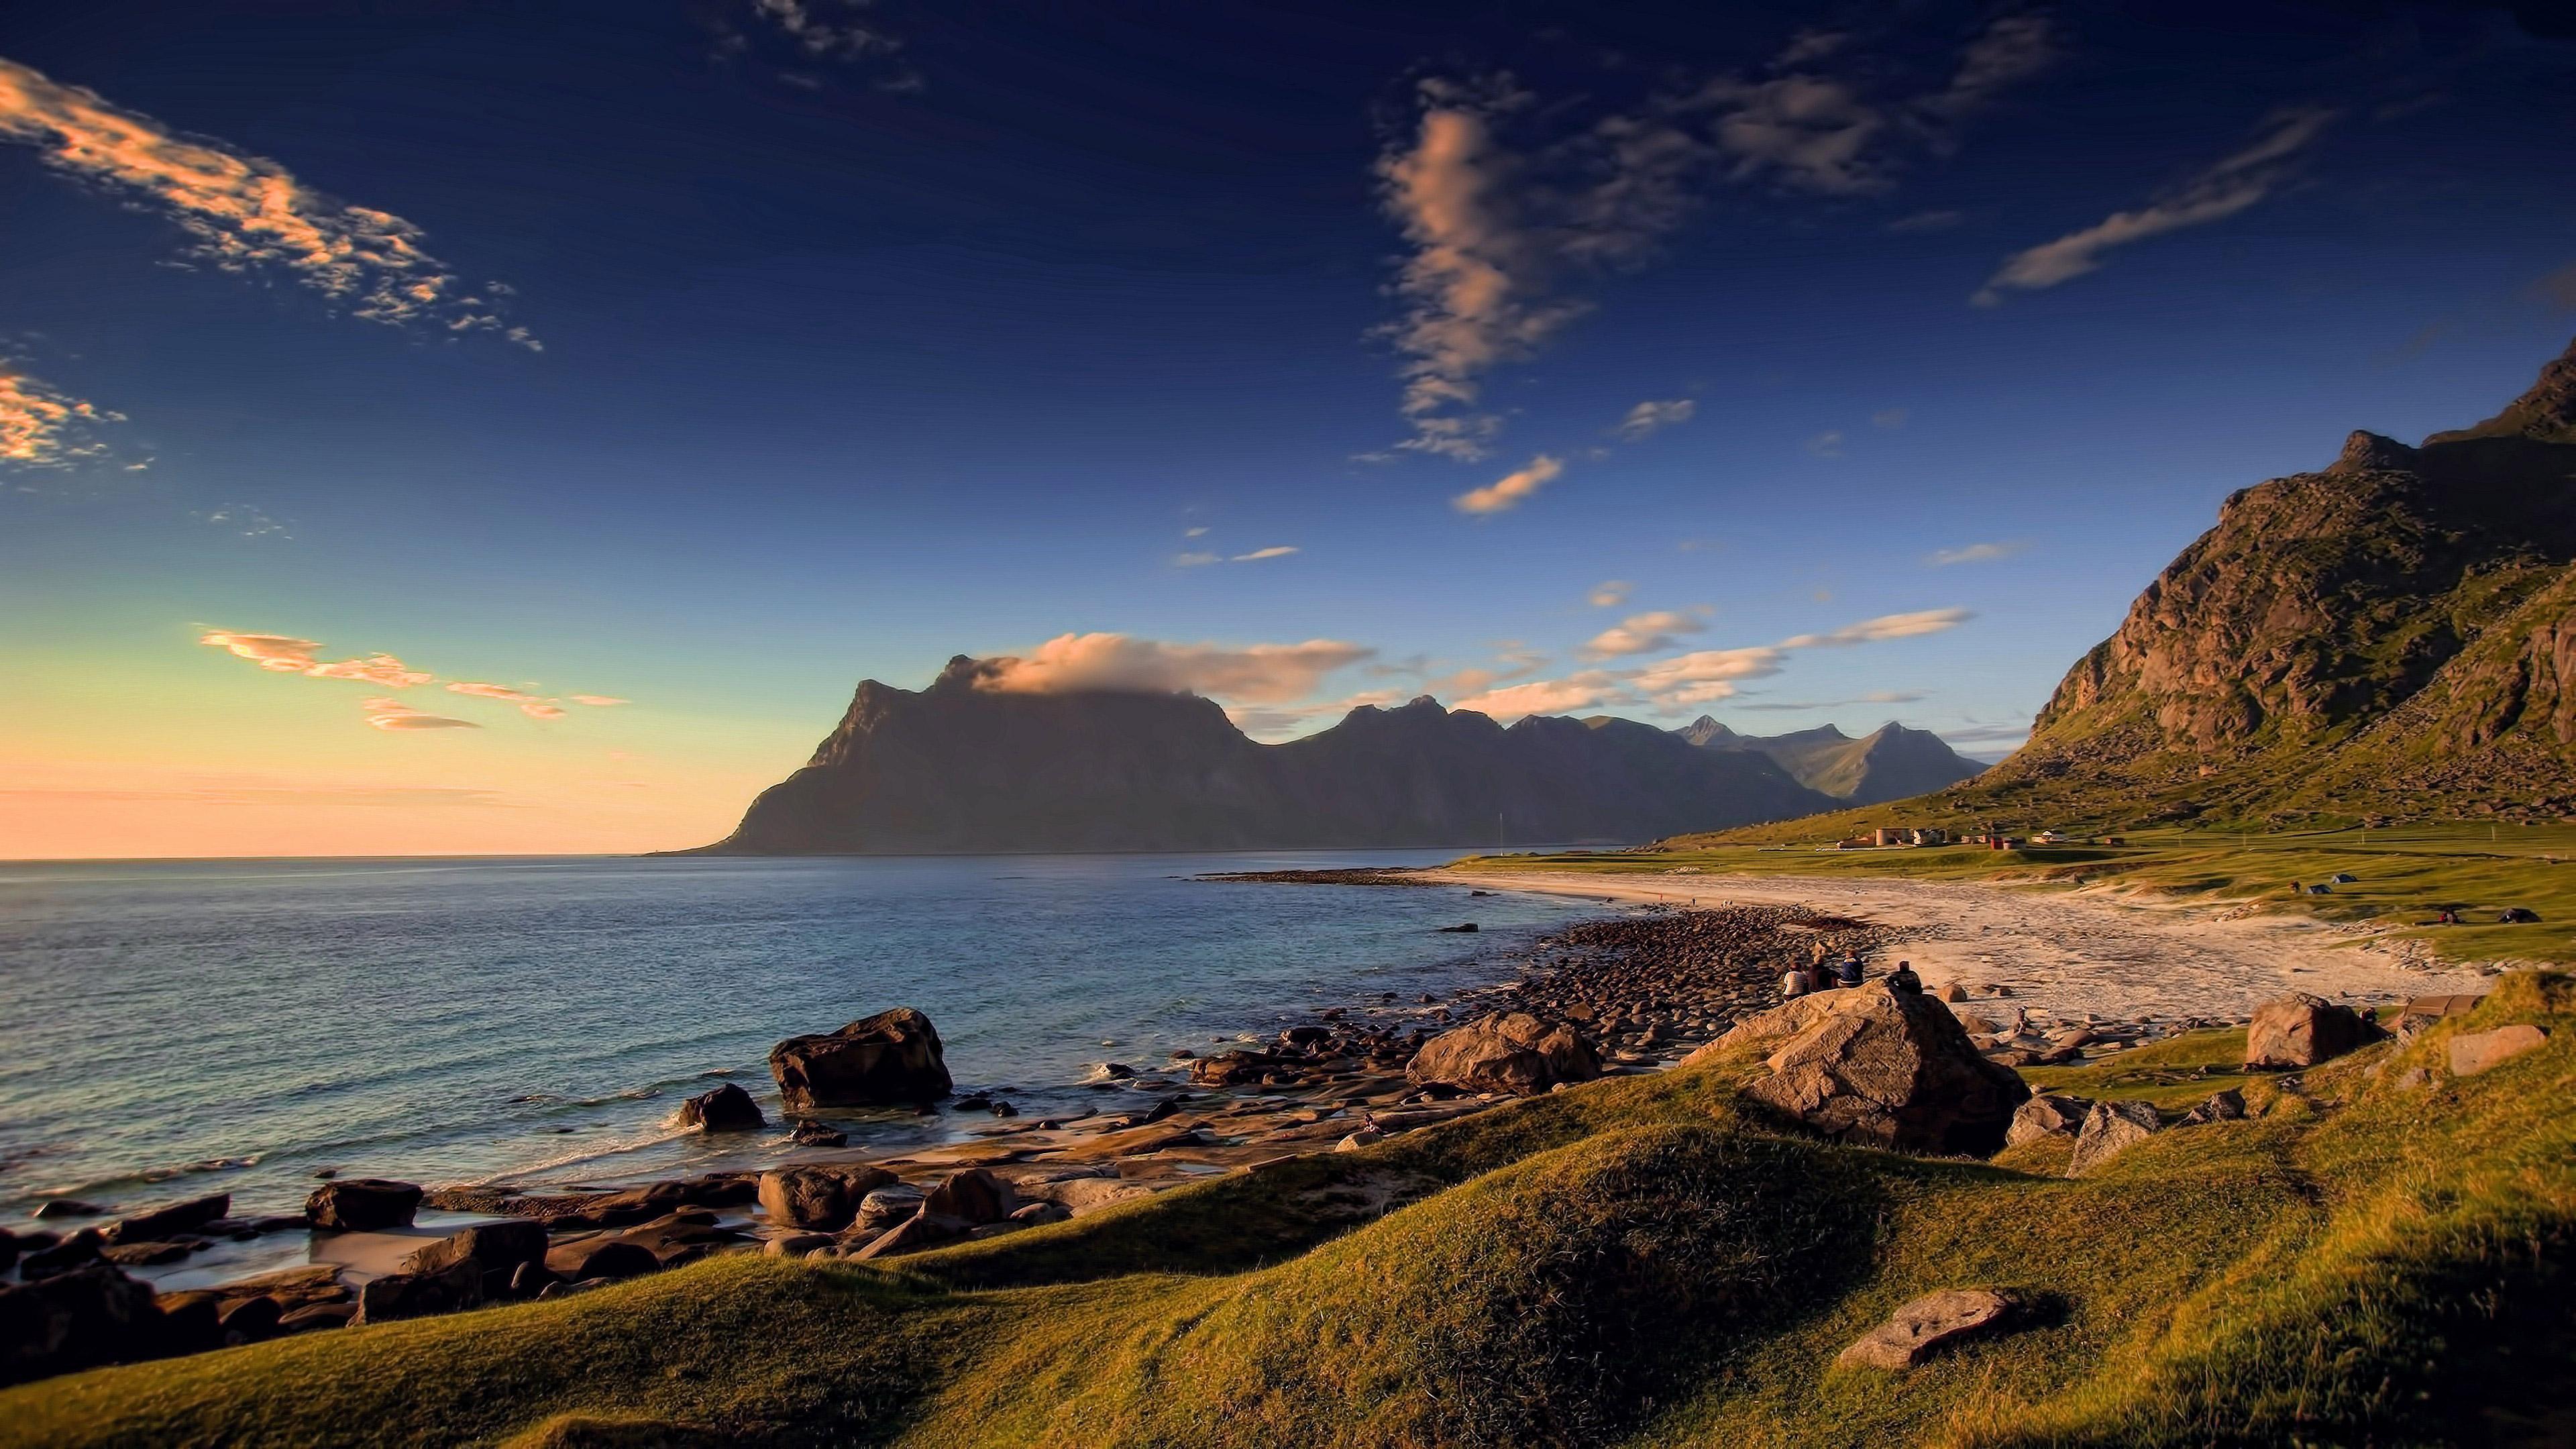 Utakleiv Beach In Norway Hd Nature 4k Wallpapers Images